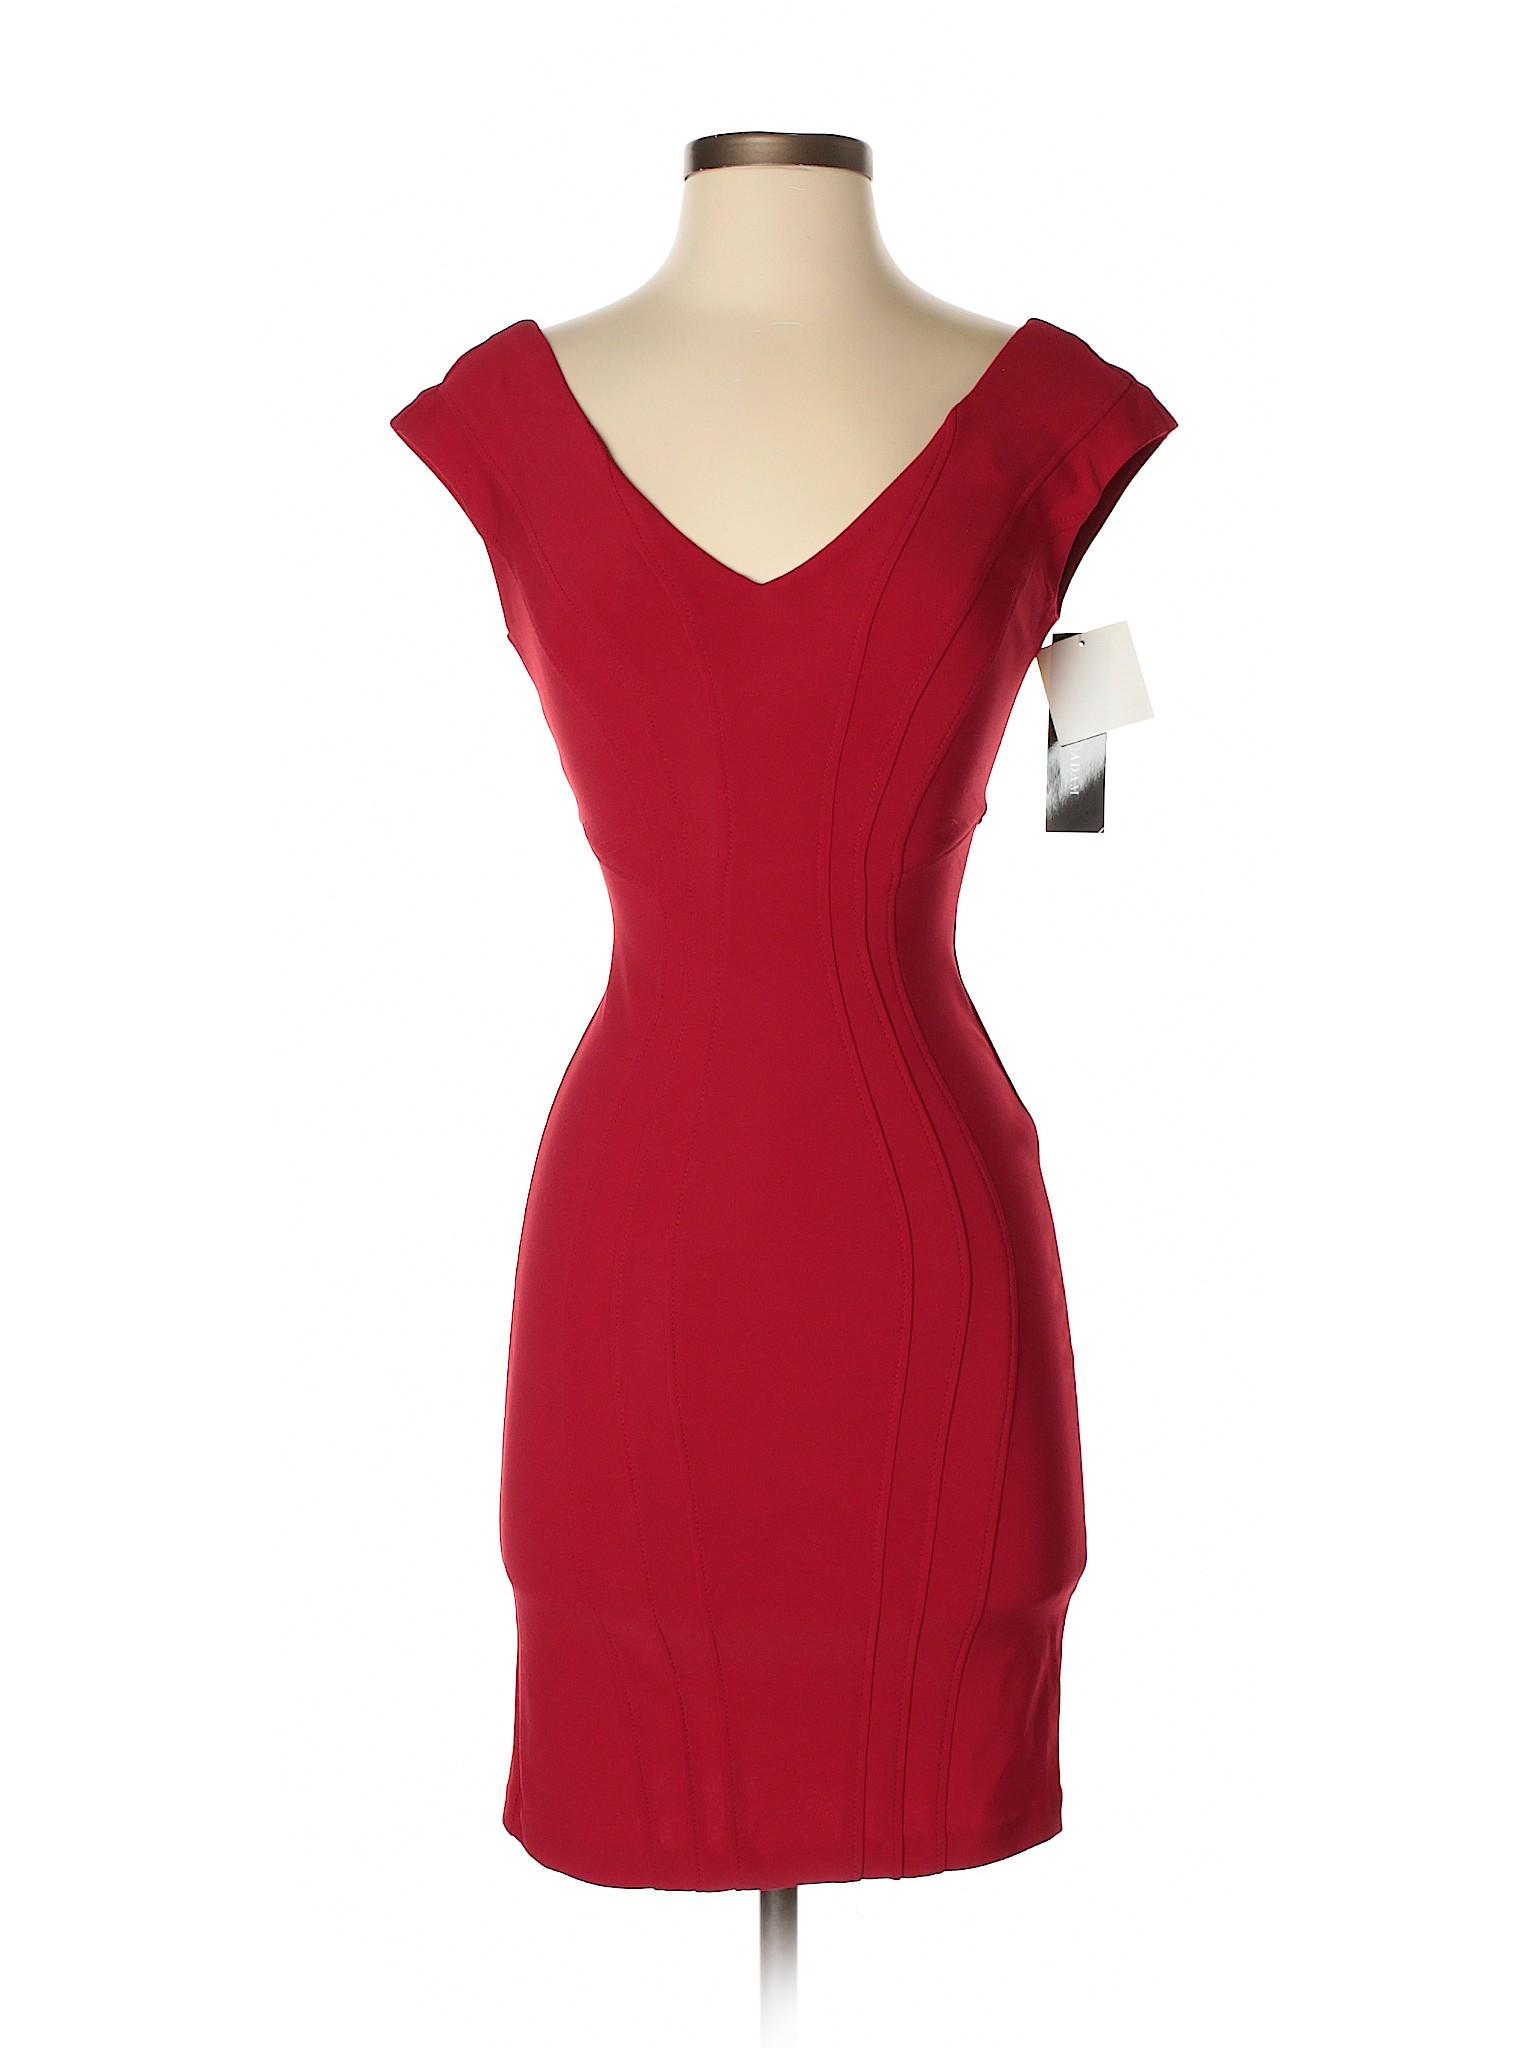 Adam Dress Betsy Selling Casual amp; 1xZwf87q